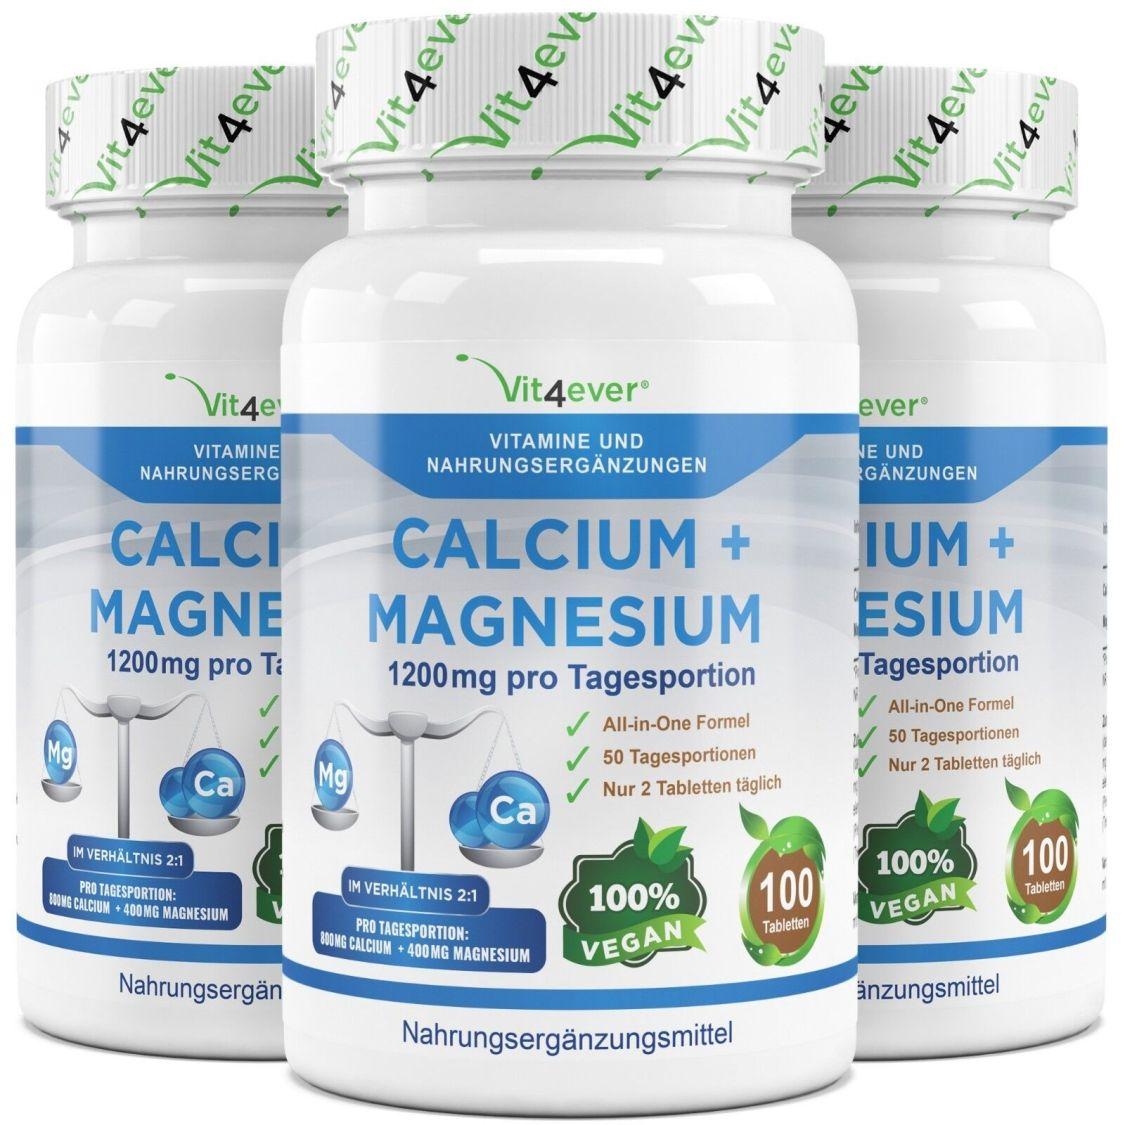 3x 100 CALCIUM & MAGNESIUM Tabletten  Vegan Hochdosiert 1200mg Kalzium no Kapsel